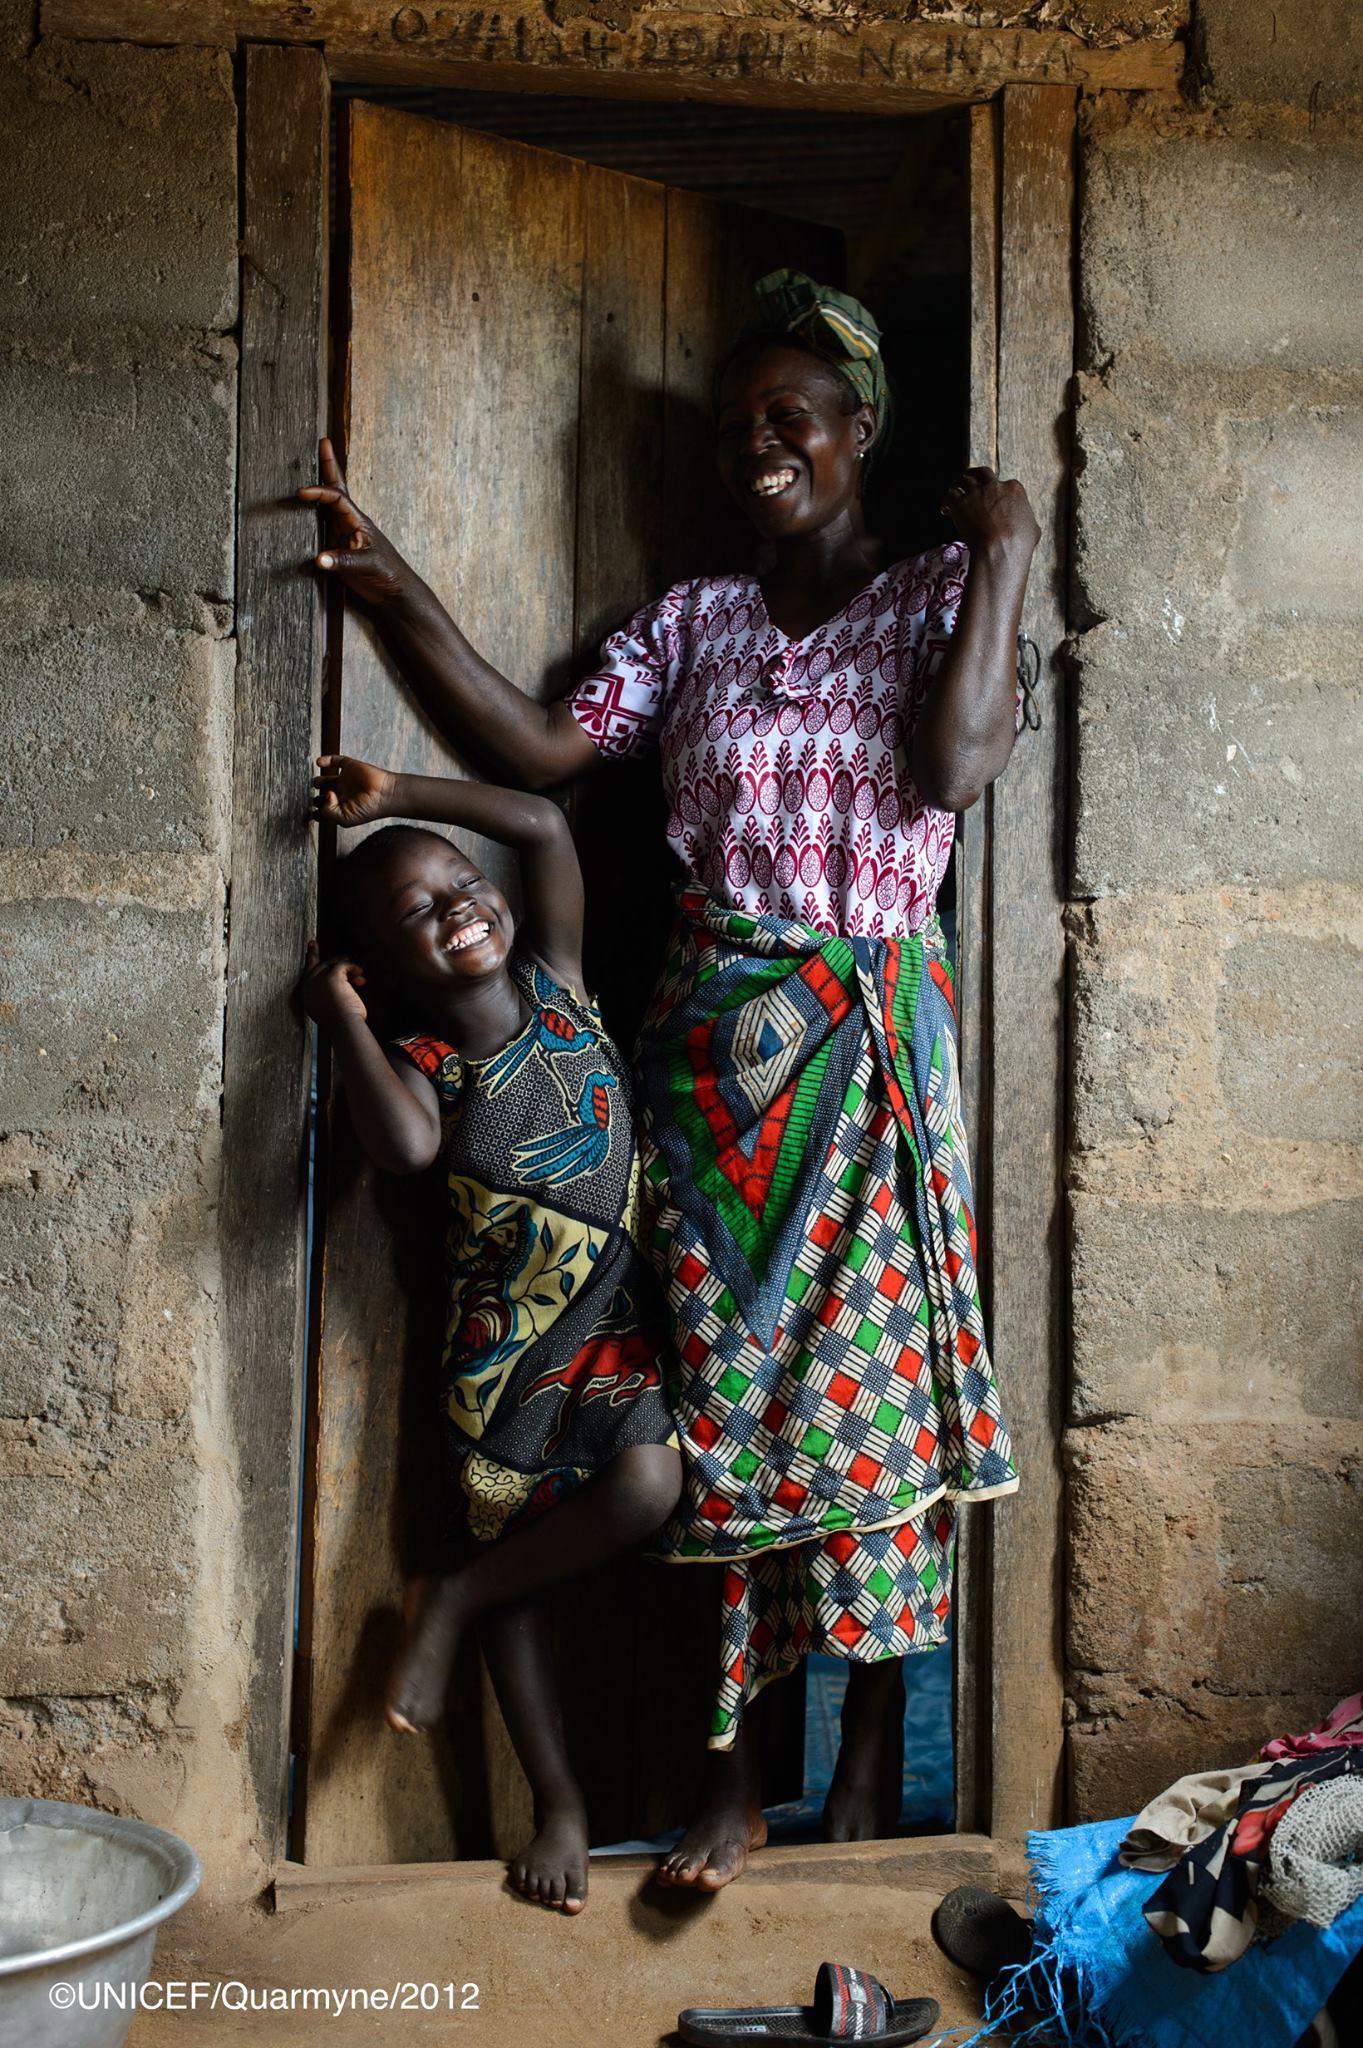 #foreverychild, joy.  Thanks for the photo @UNICEFGhana https://t.co/5EIHWovA72